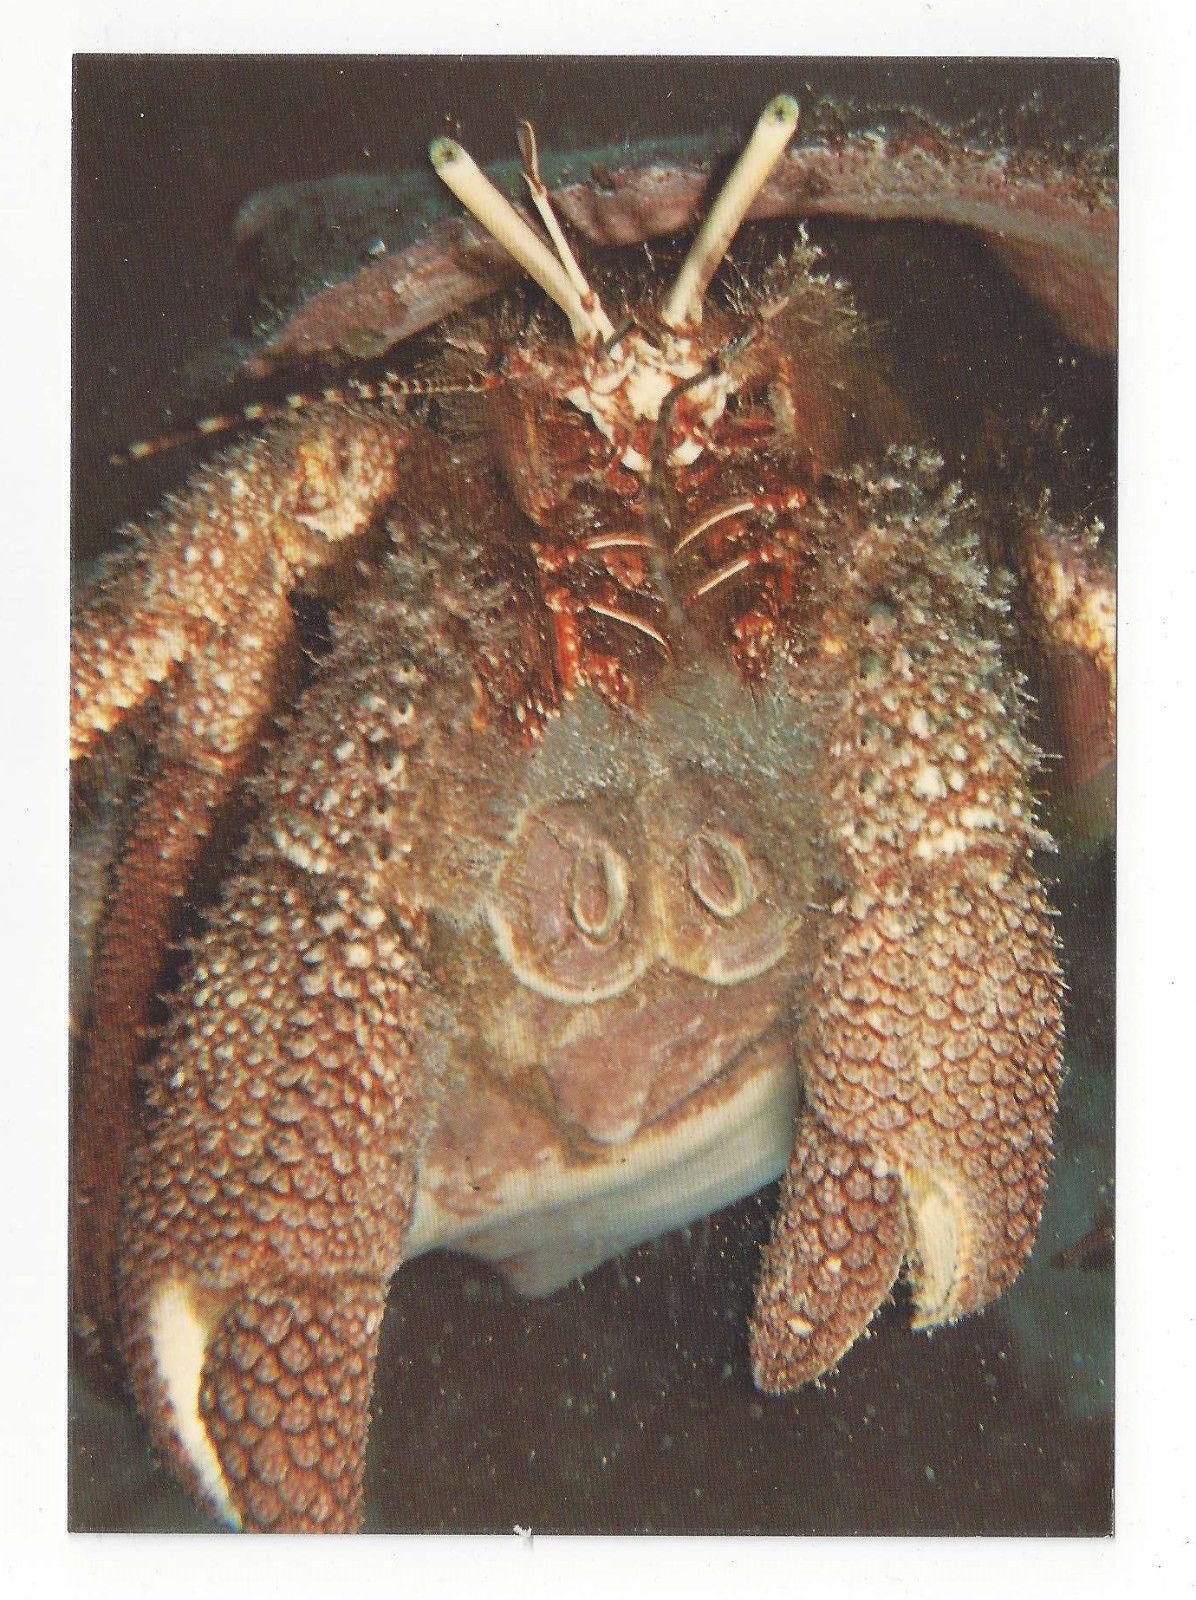 Giant Hemit Crab Caribbean Antilles Ocean Shellfish Vtg Chrome Postcard 4X6